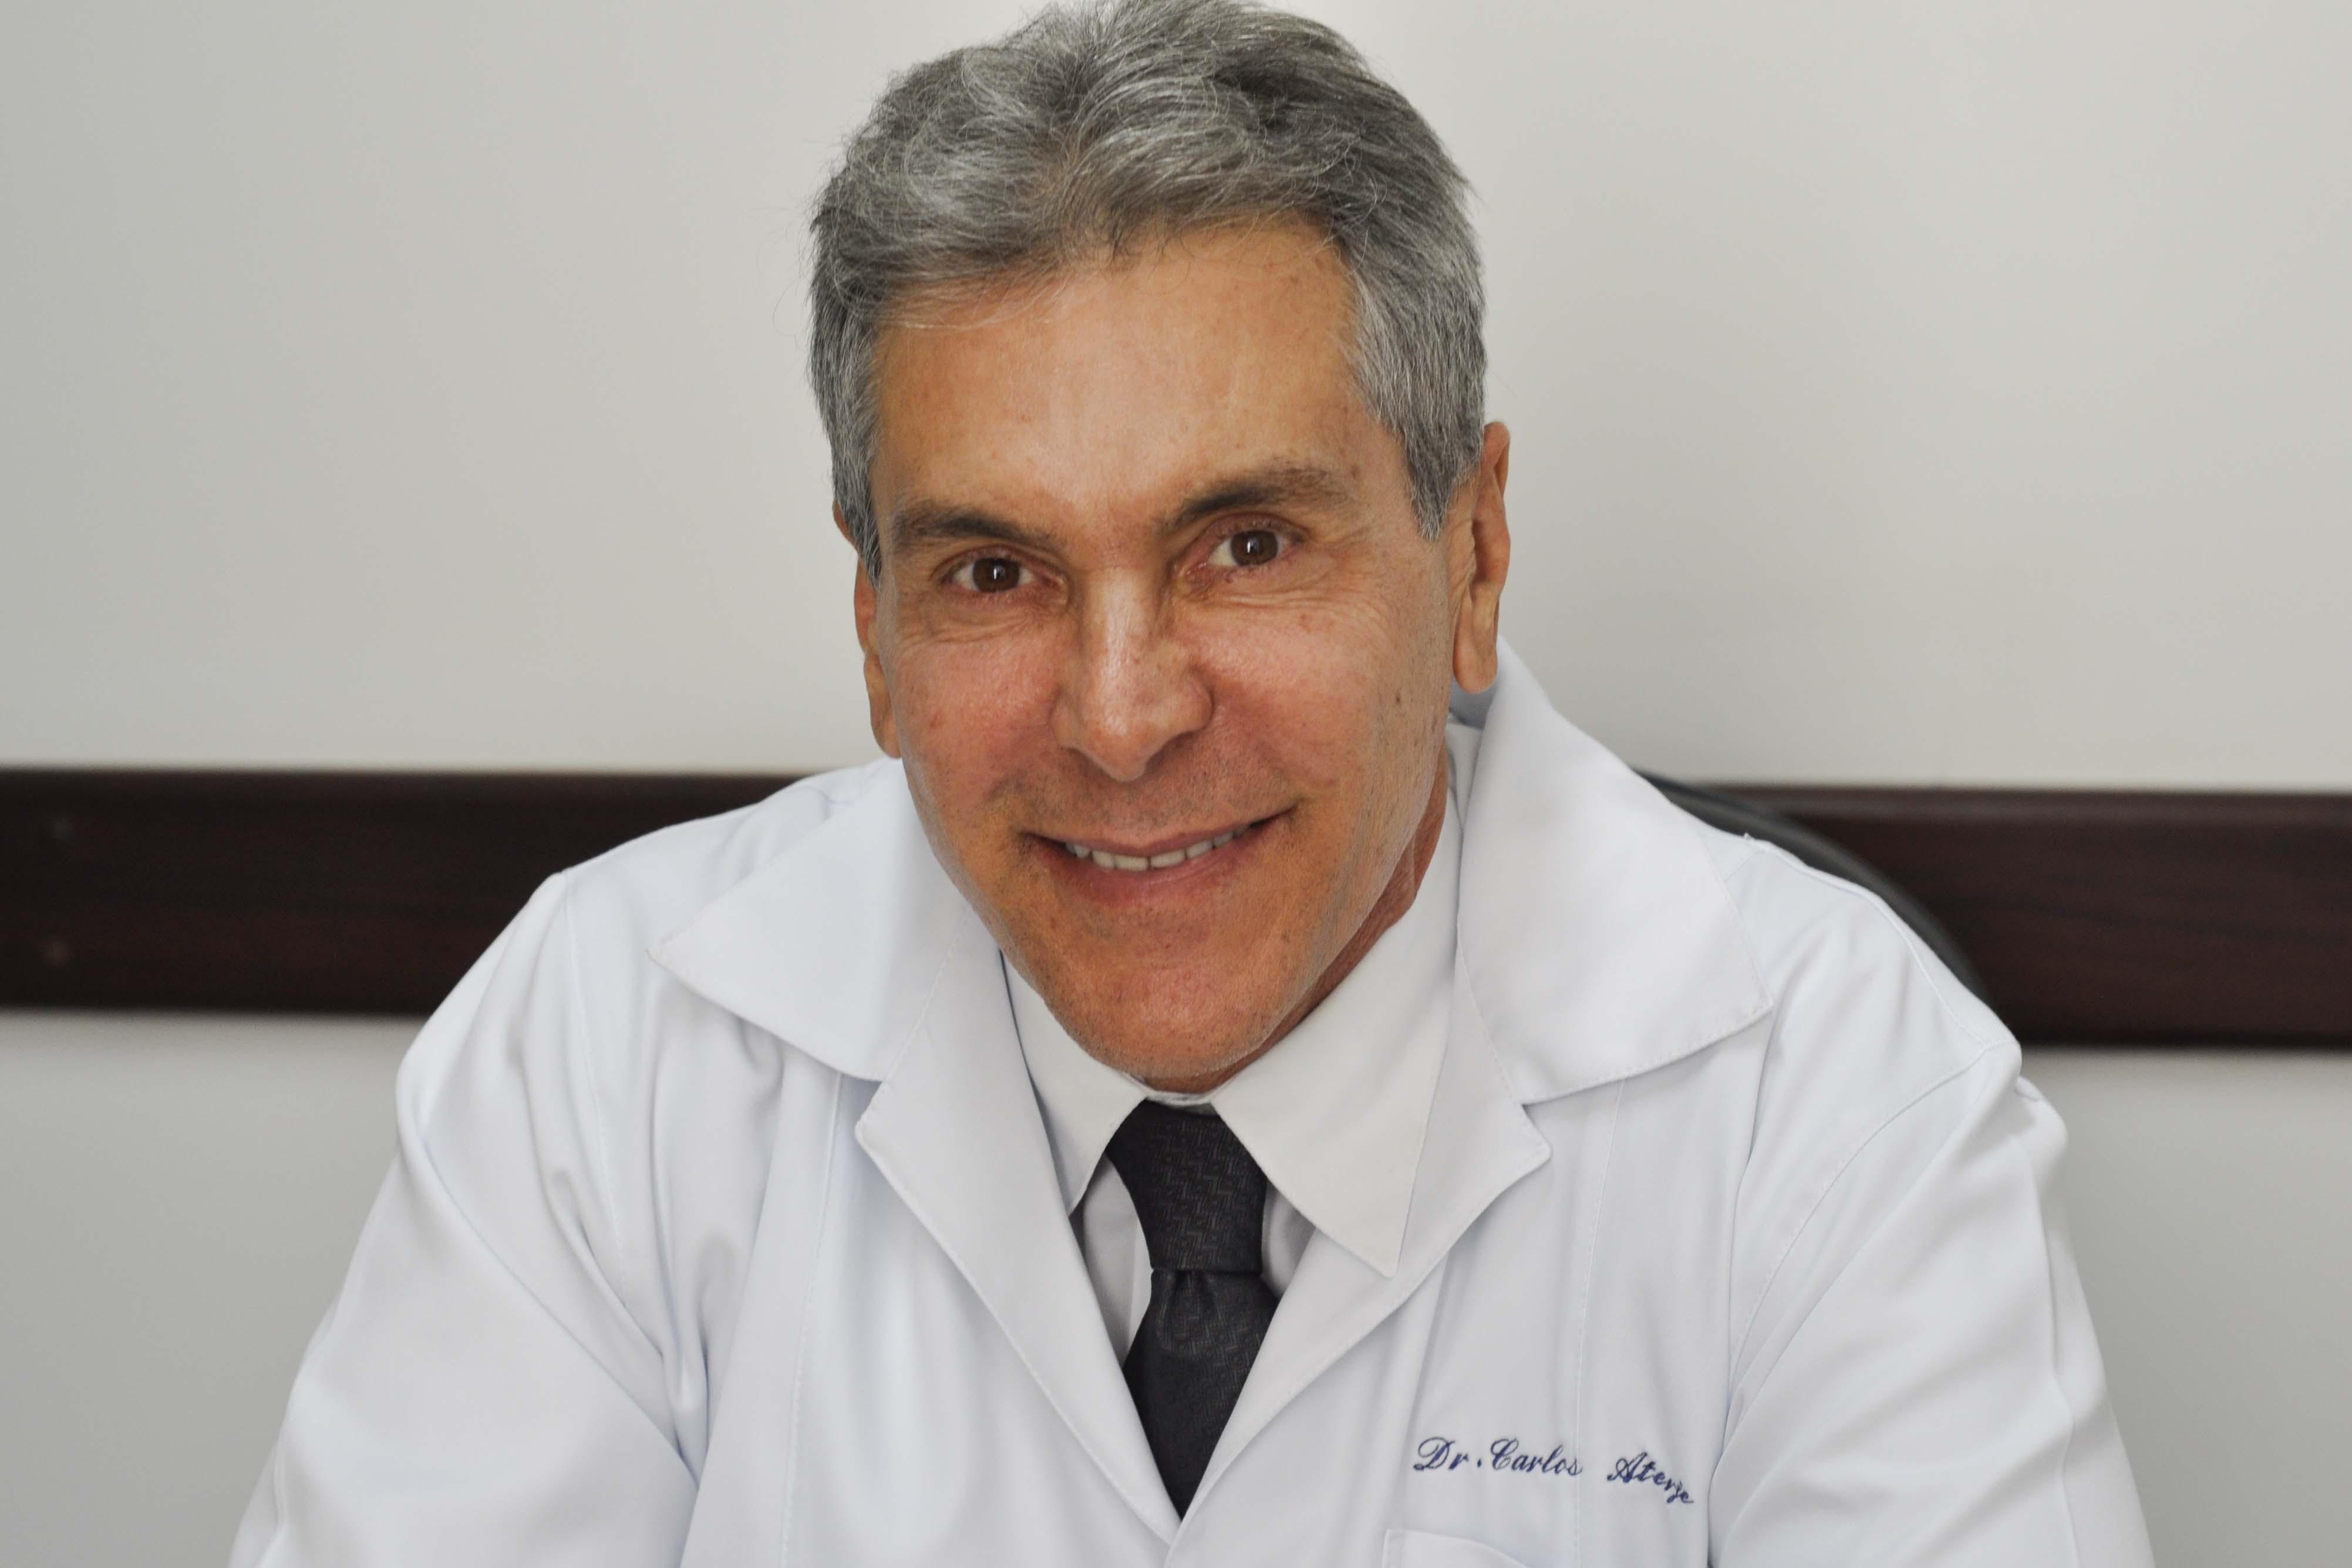 Estresse pode causar terçol, garante dr. Carlos Aterje